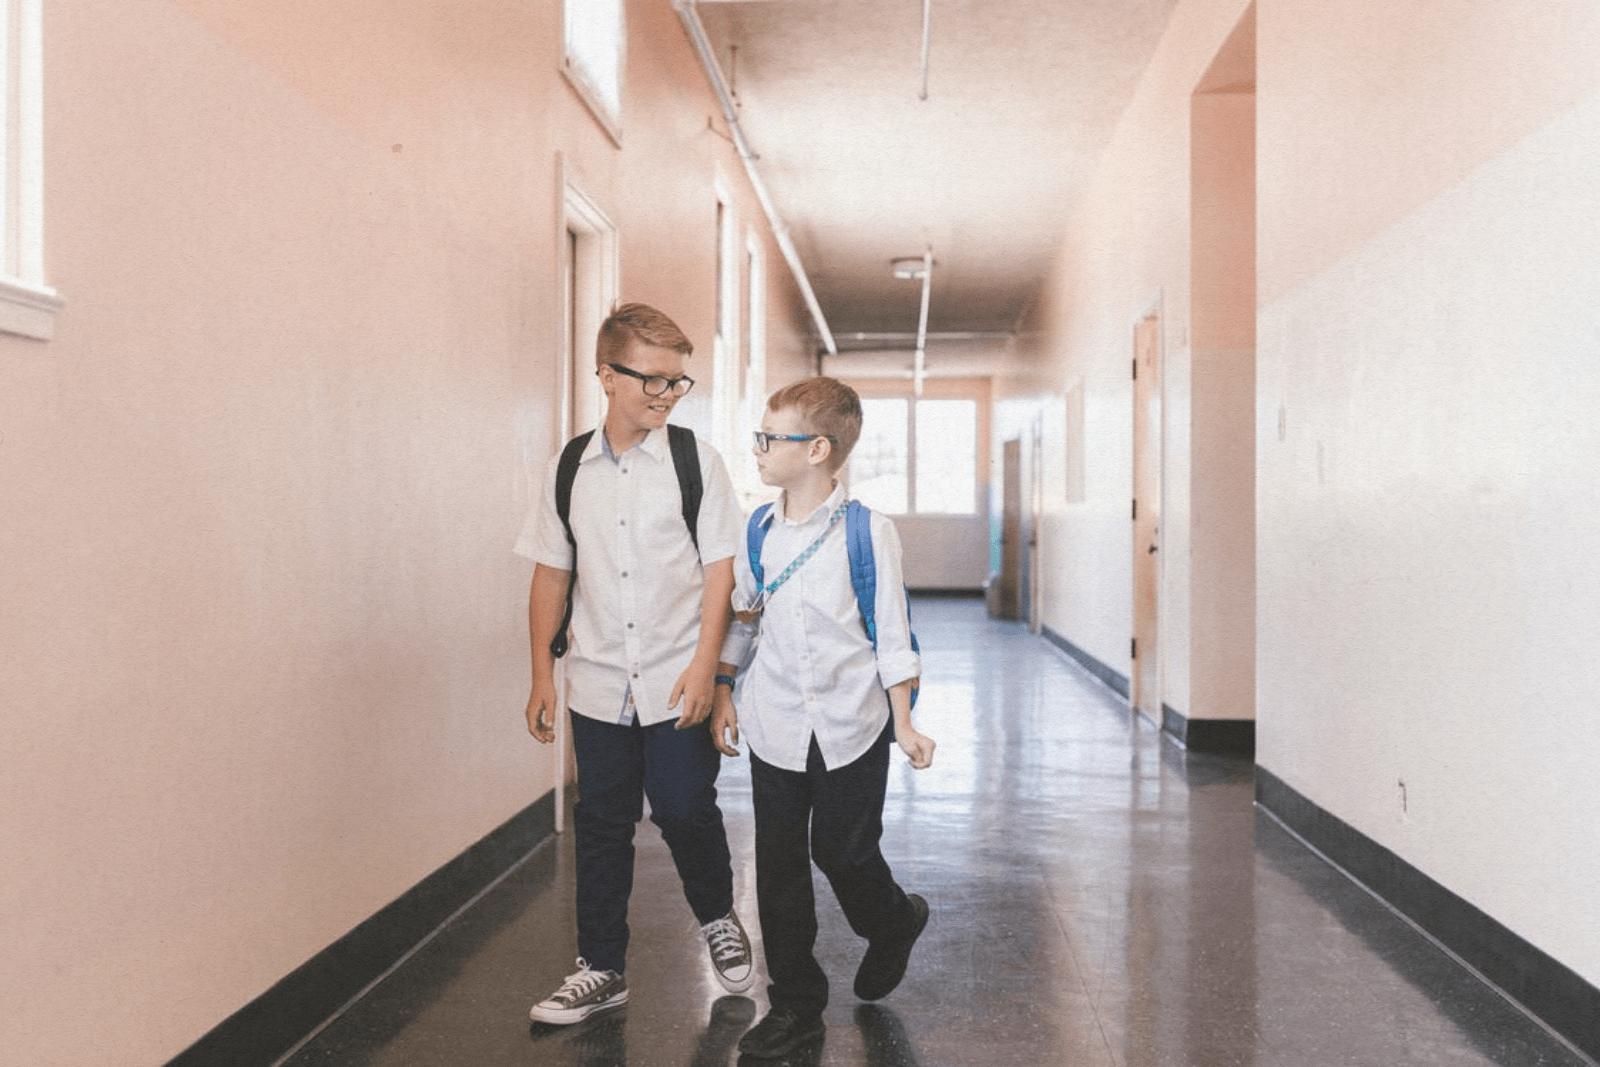 two young boys in school hallway